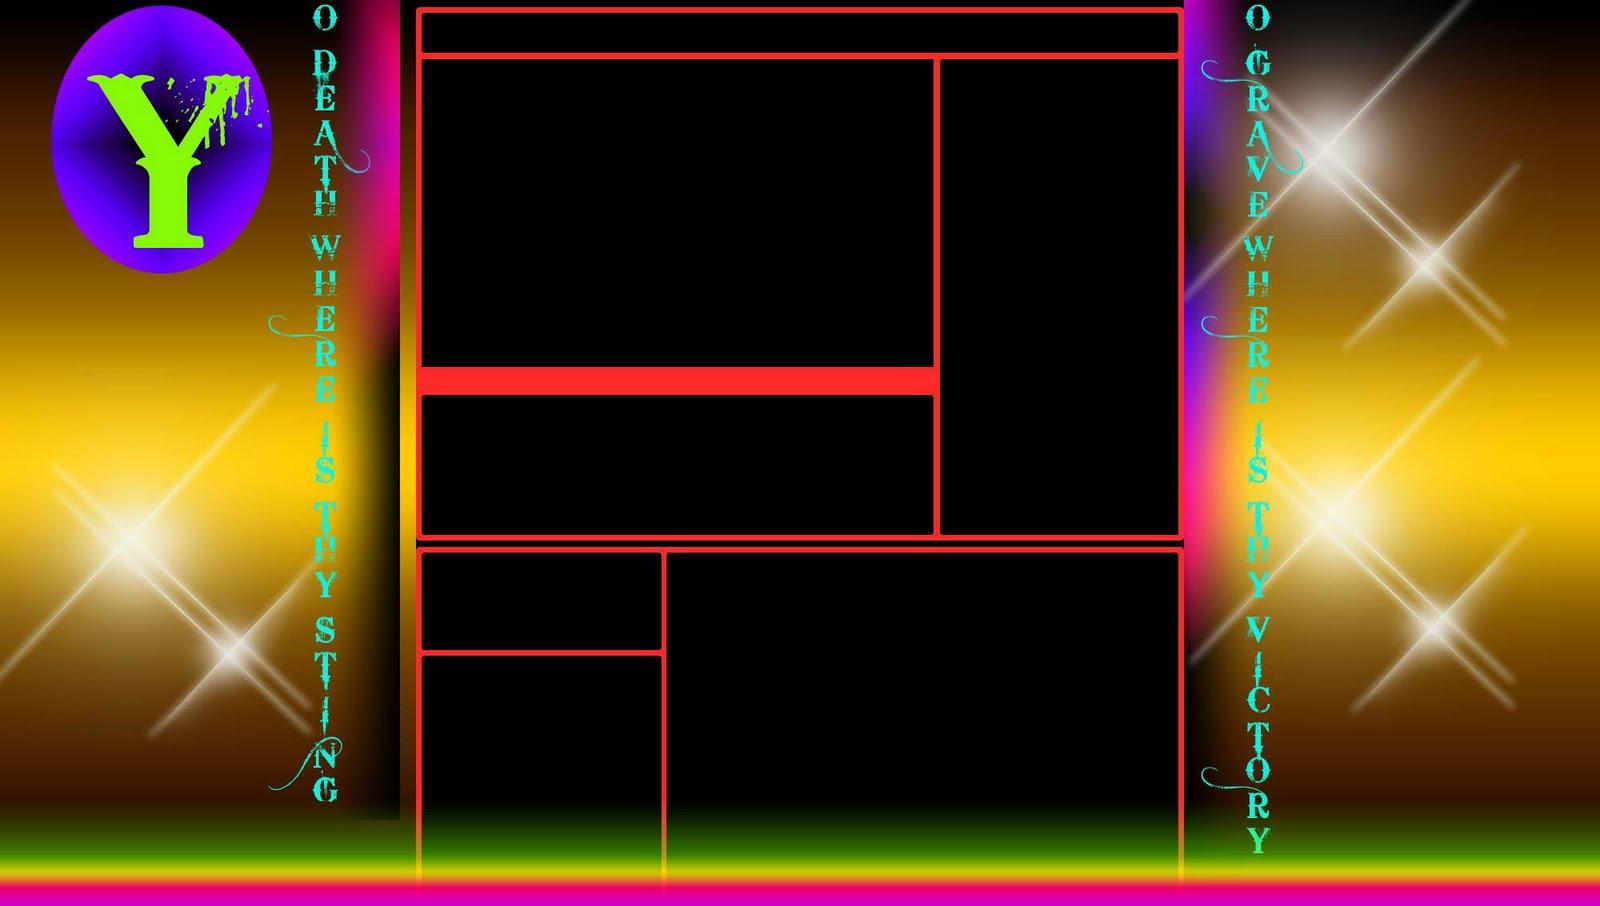 http://1.bp.blogspot.com/-Lfl4FaDV08k/TwNsYzj4QGI/AAAAAAAACjQ/EdaYicG7zvA/s1600/wallpaper-youtube-channel-fondo-718813.jpg